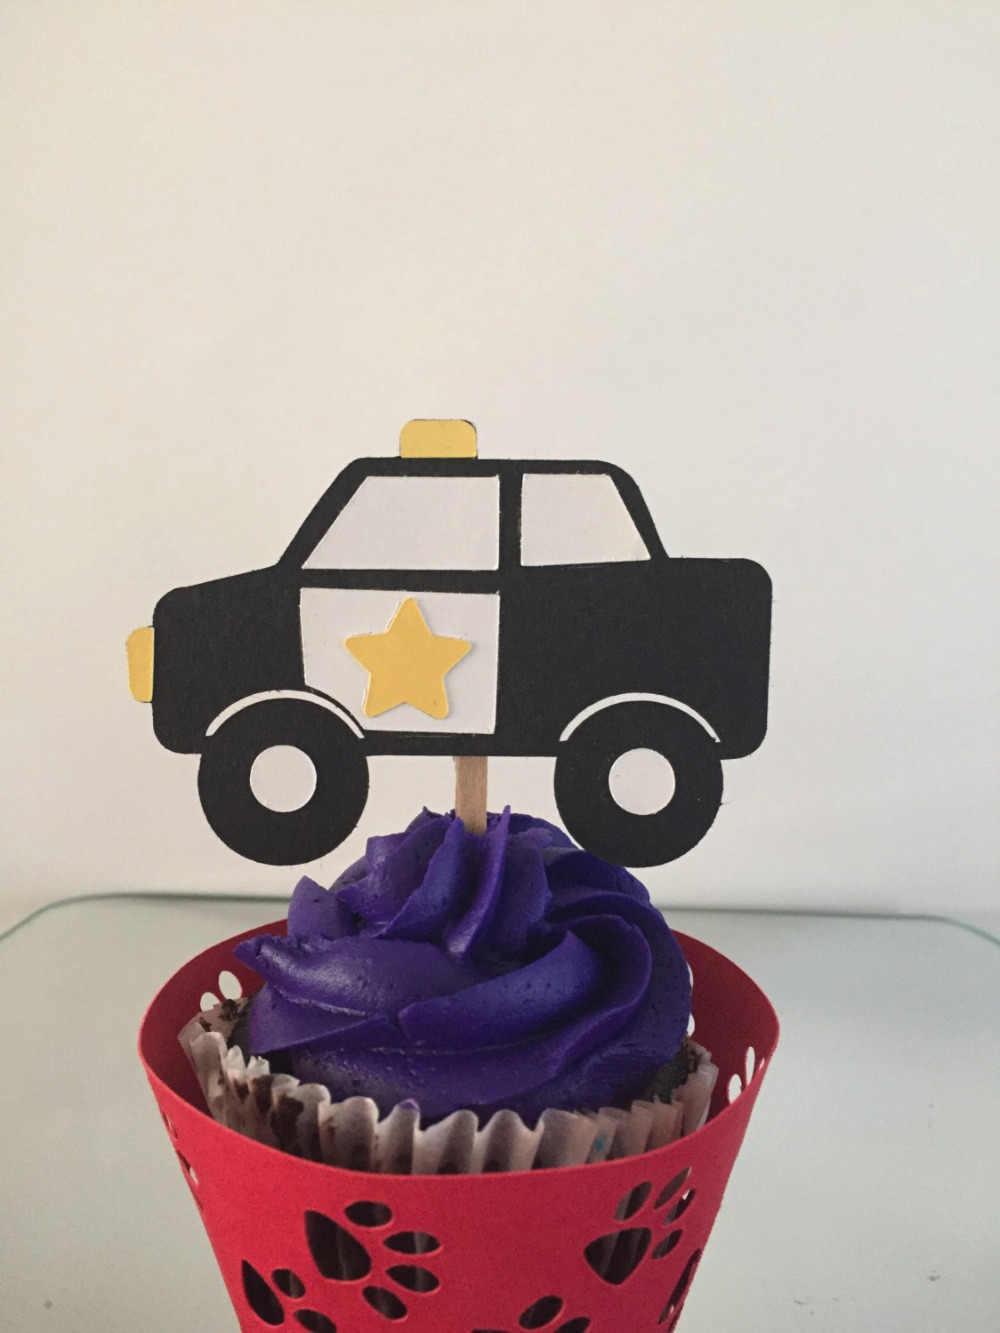 12 Pcs Kartun Mobil Polisi Cupcake Toppers Pilihan Anak Ulang Tahun Tema Pesta Dekorasi Anak Anak Nikmat Natal Kue